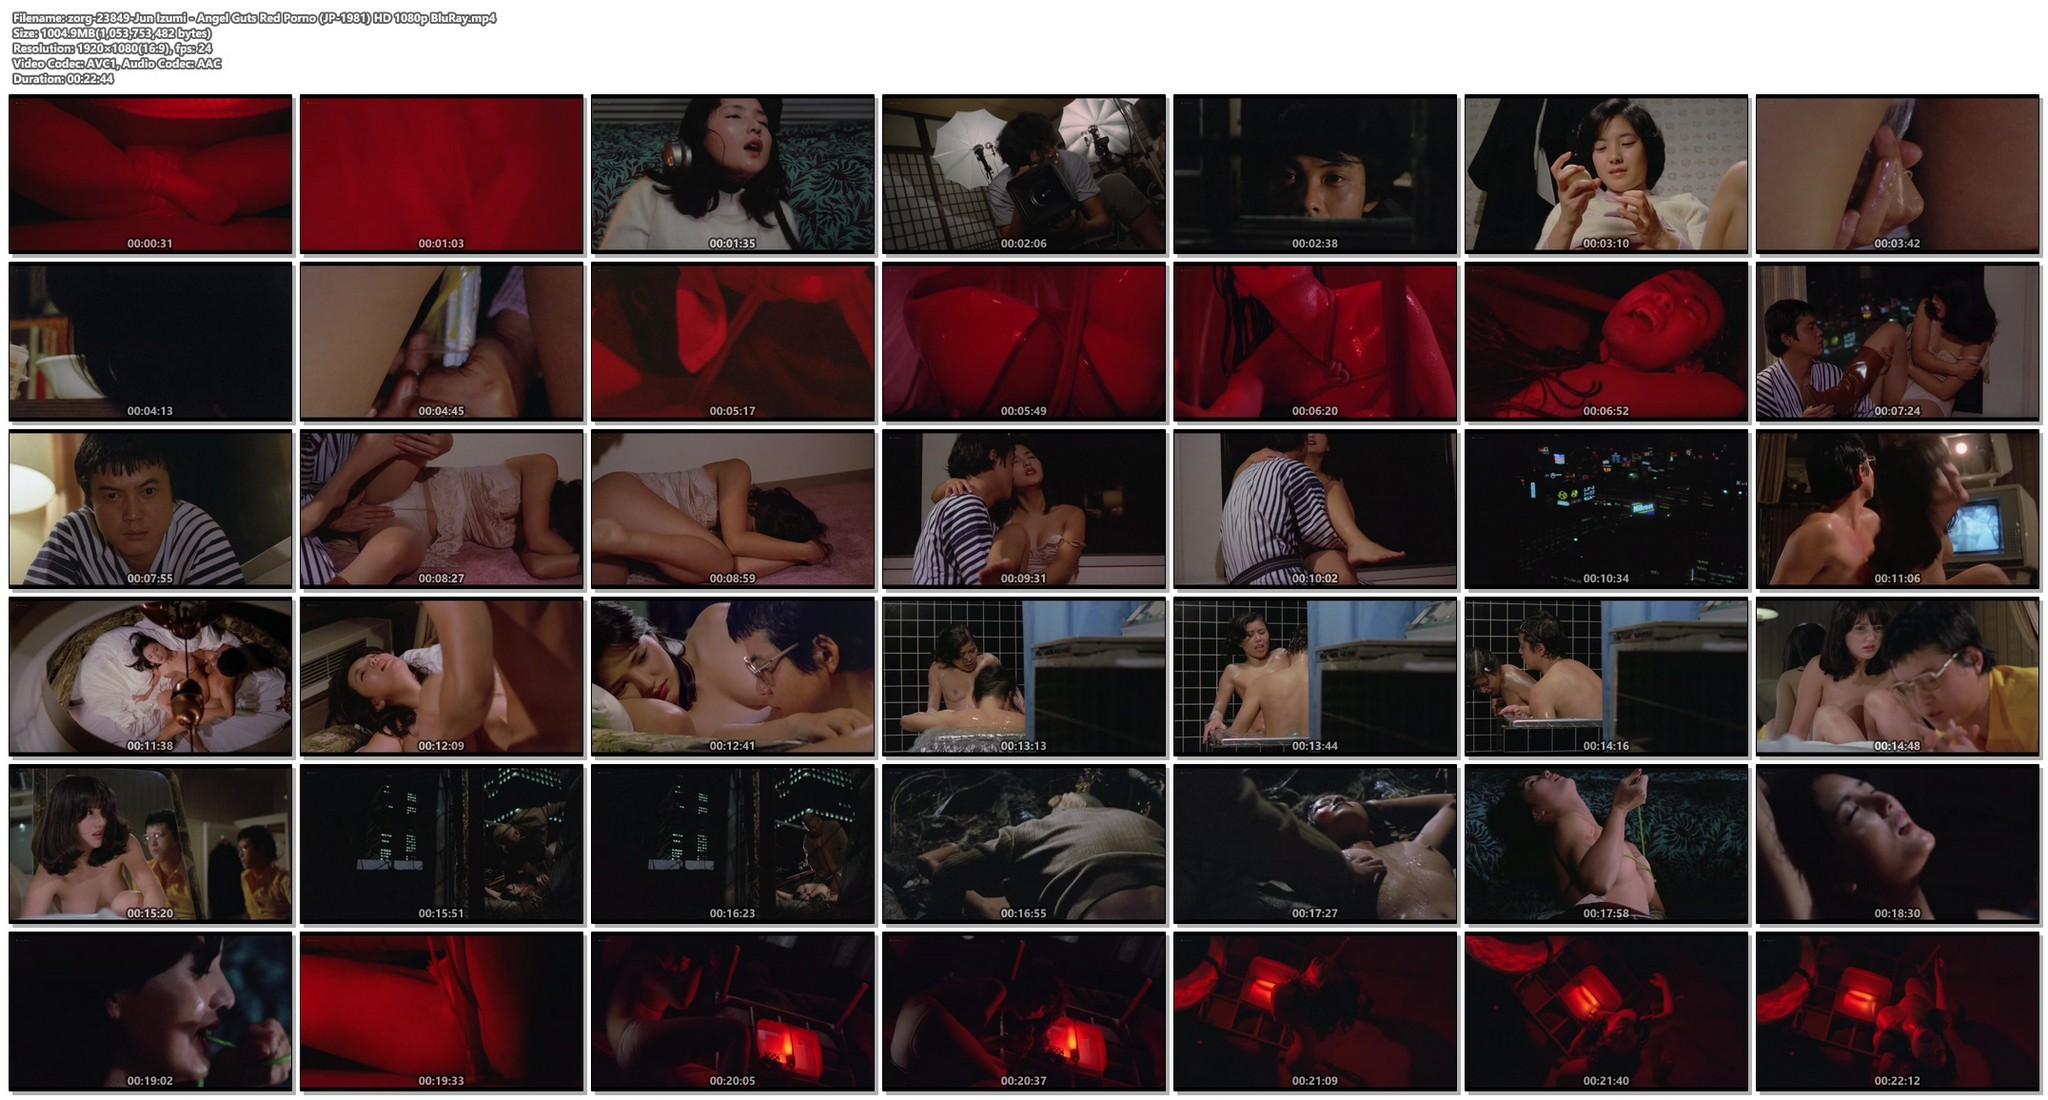 Jun Izumi nude hot sex - Angel Guts: Red Porno (JP-1981) HD 1080p BluRay (1)